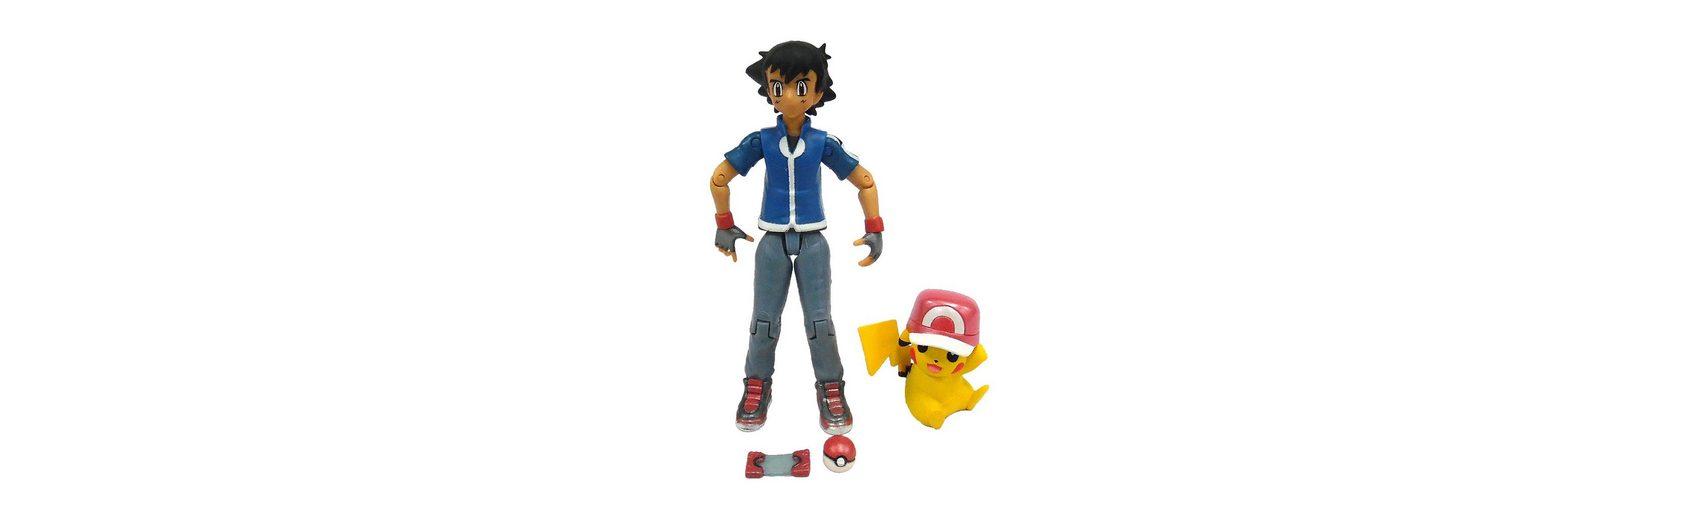 TOMY Pokémon - Ash Spielfigur mit Pikachu